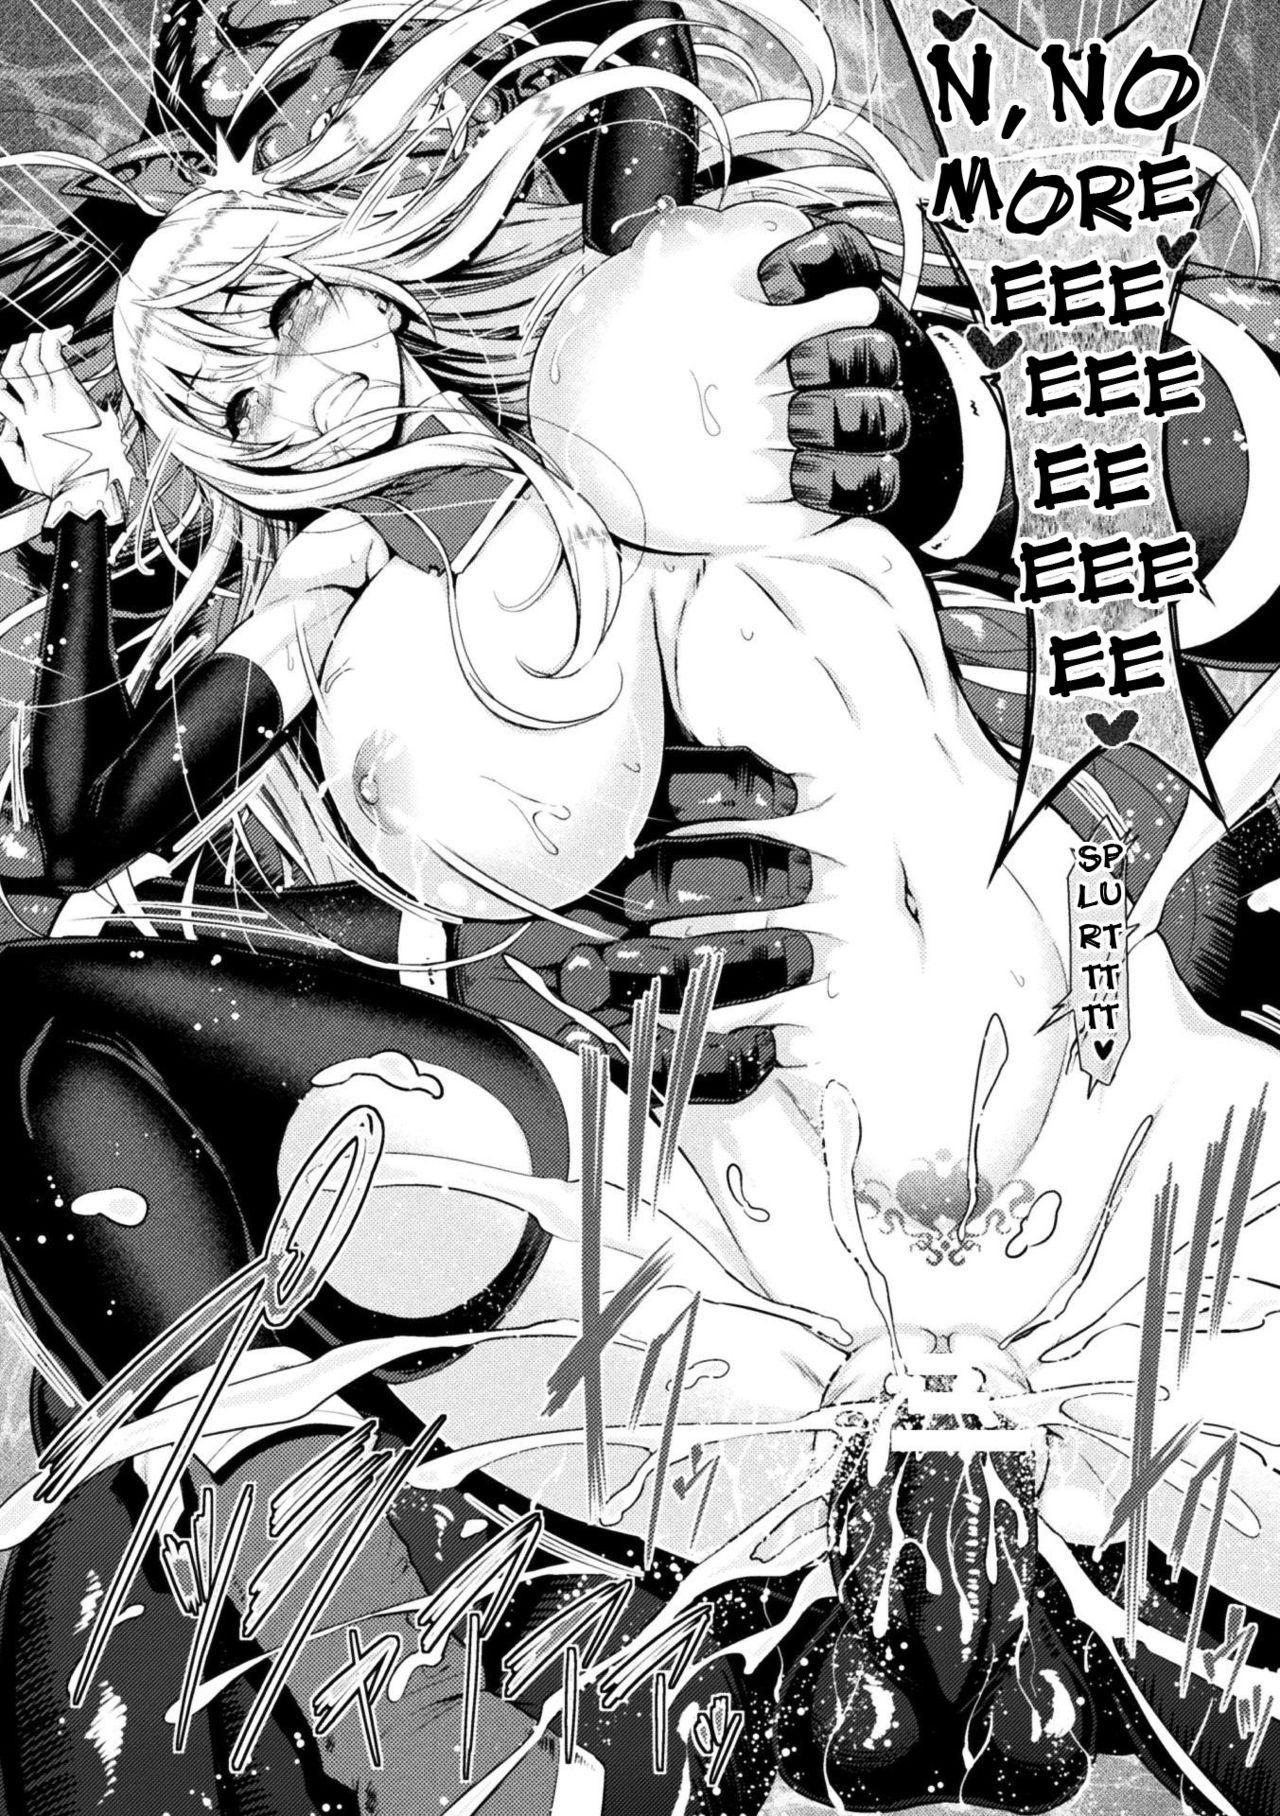 [Yamada Gogogo] Erona ~Orc no Inmon ni Okasareta Onna Kishi no Matsuro~   Erona ~The Fall of a Beautiful Knight Cursed with the Lewd Mark of an Orc~ Ch. 1-6 [English] {darknight} 46